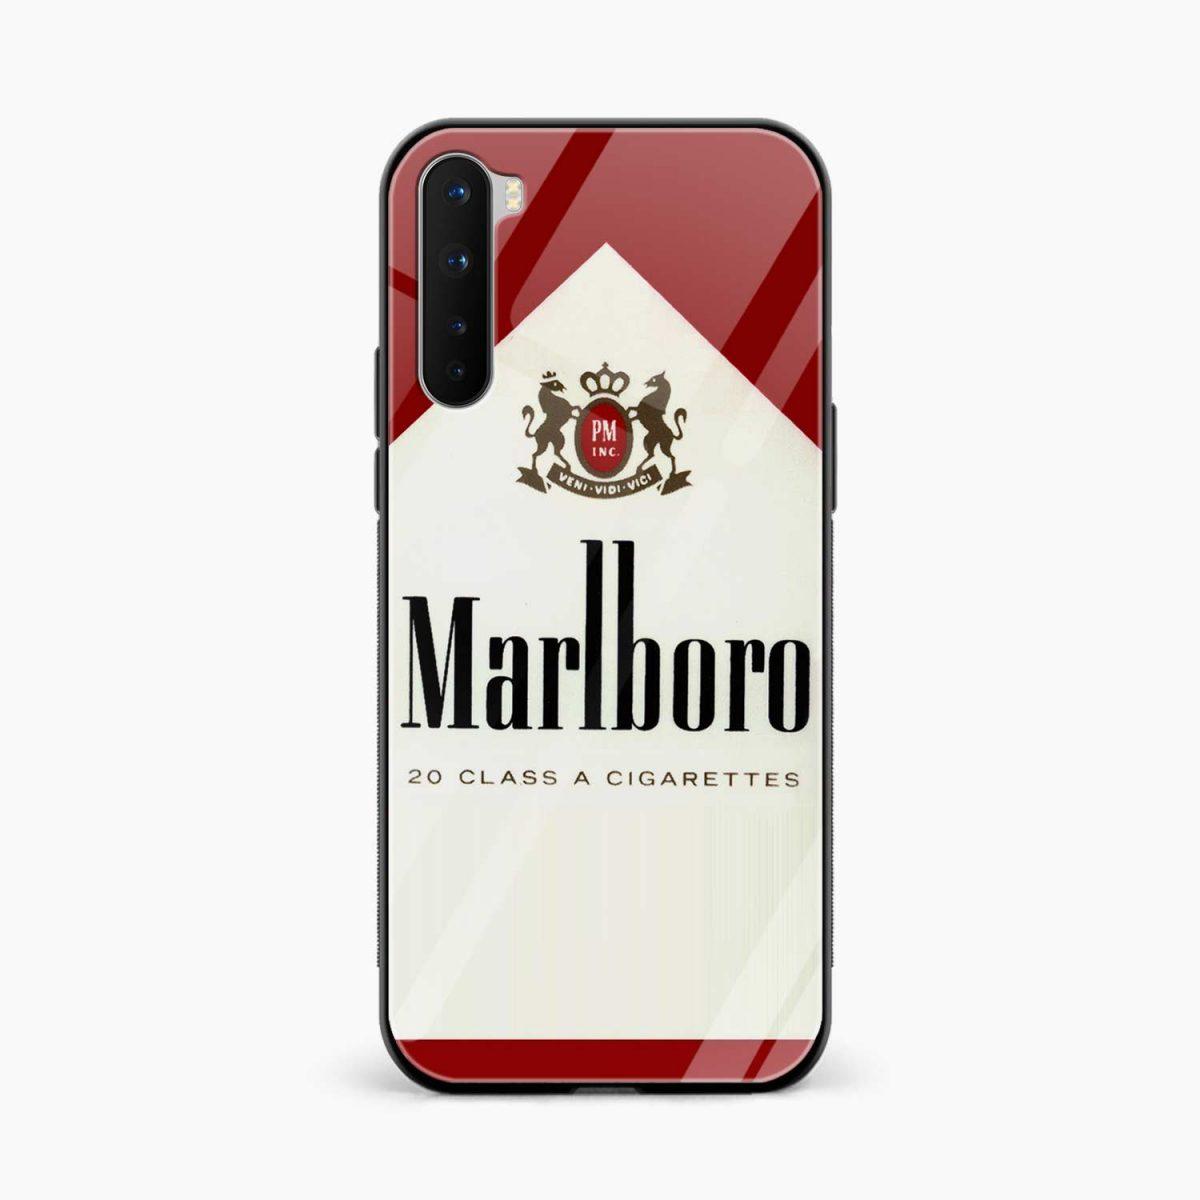 marlboro cigarette box front view oneplus nord back cover